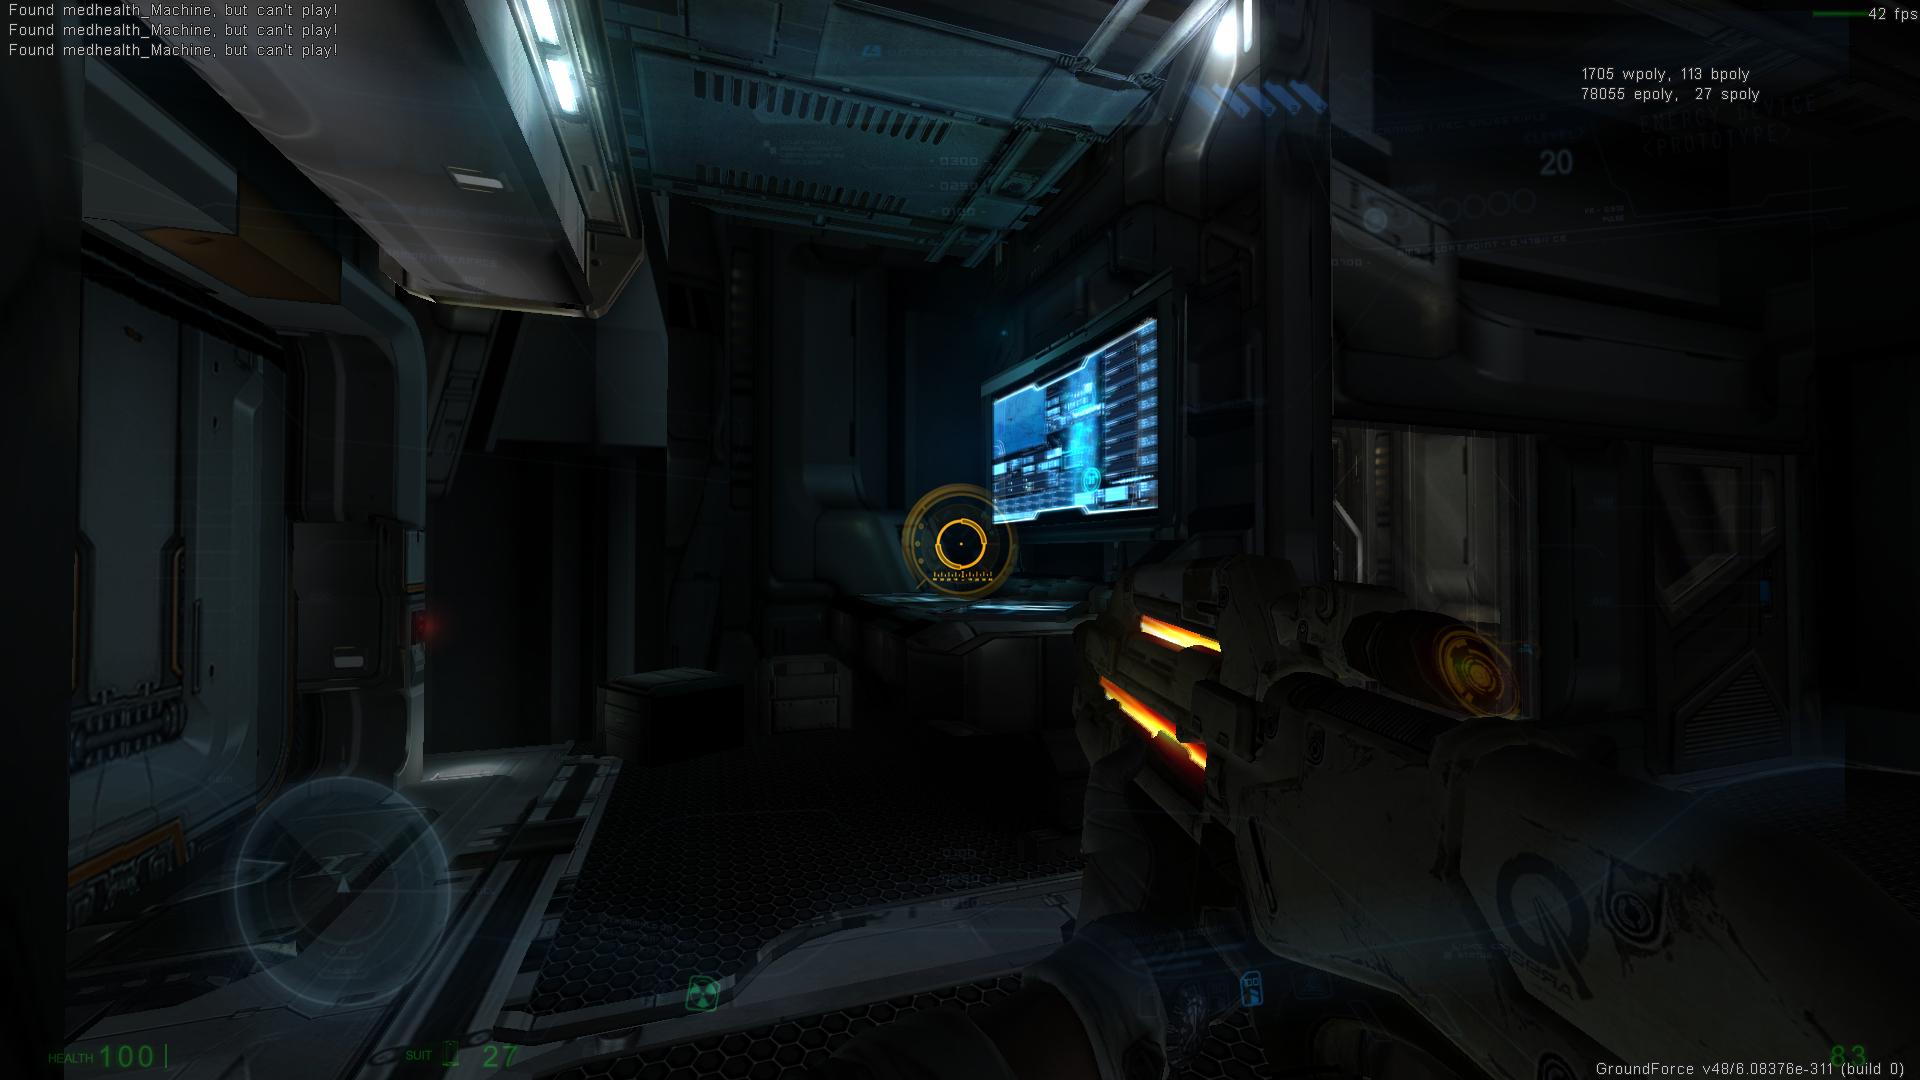 ew_teleportation_docking_0032